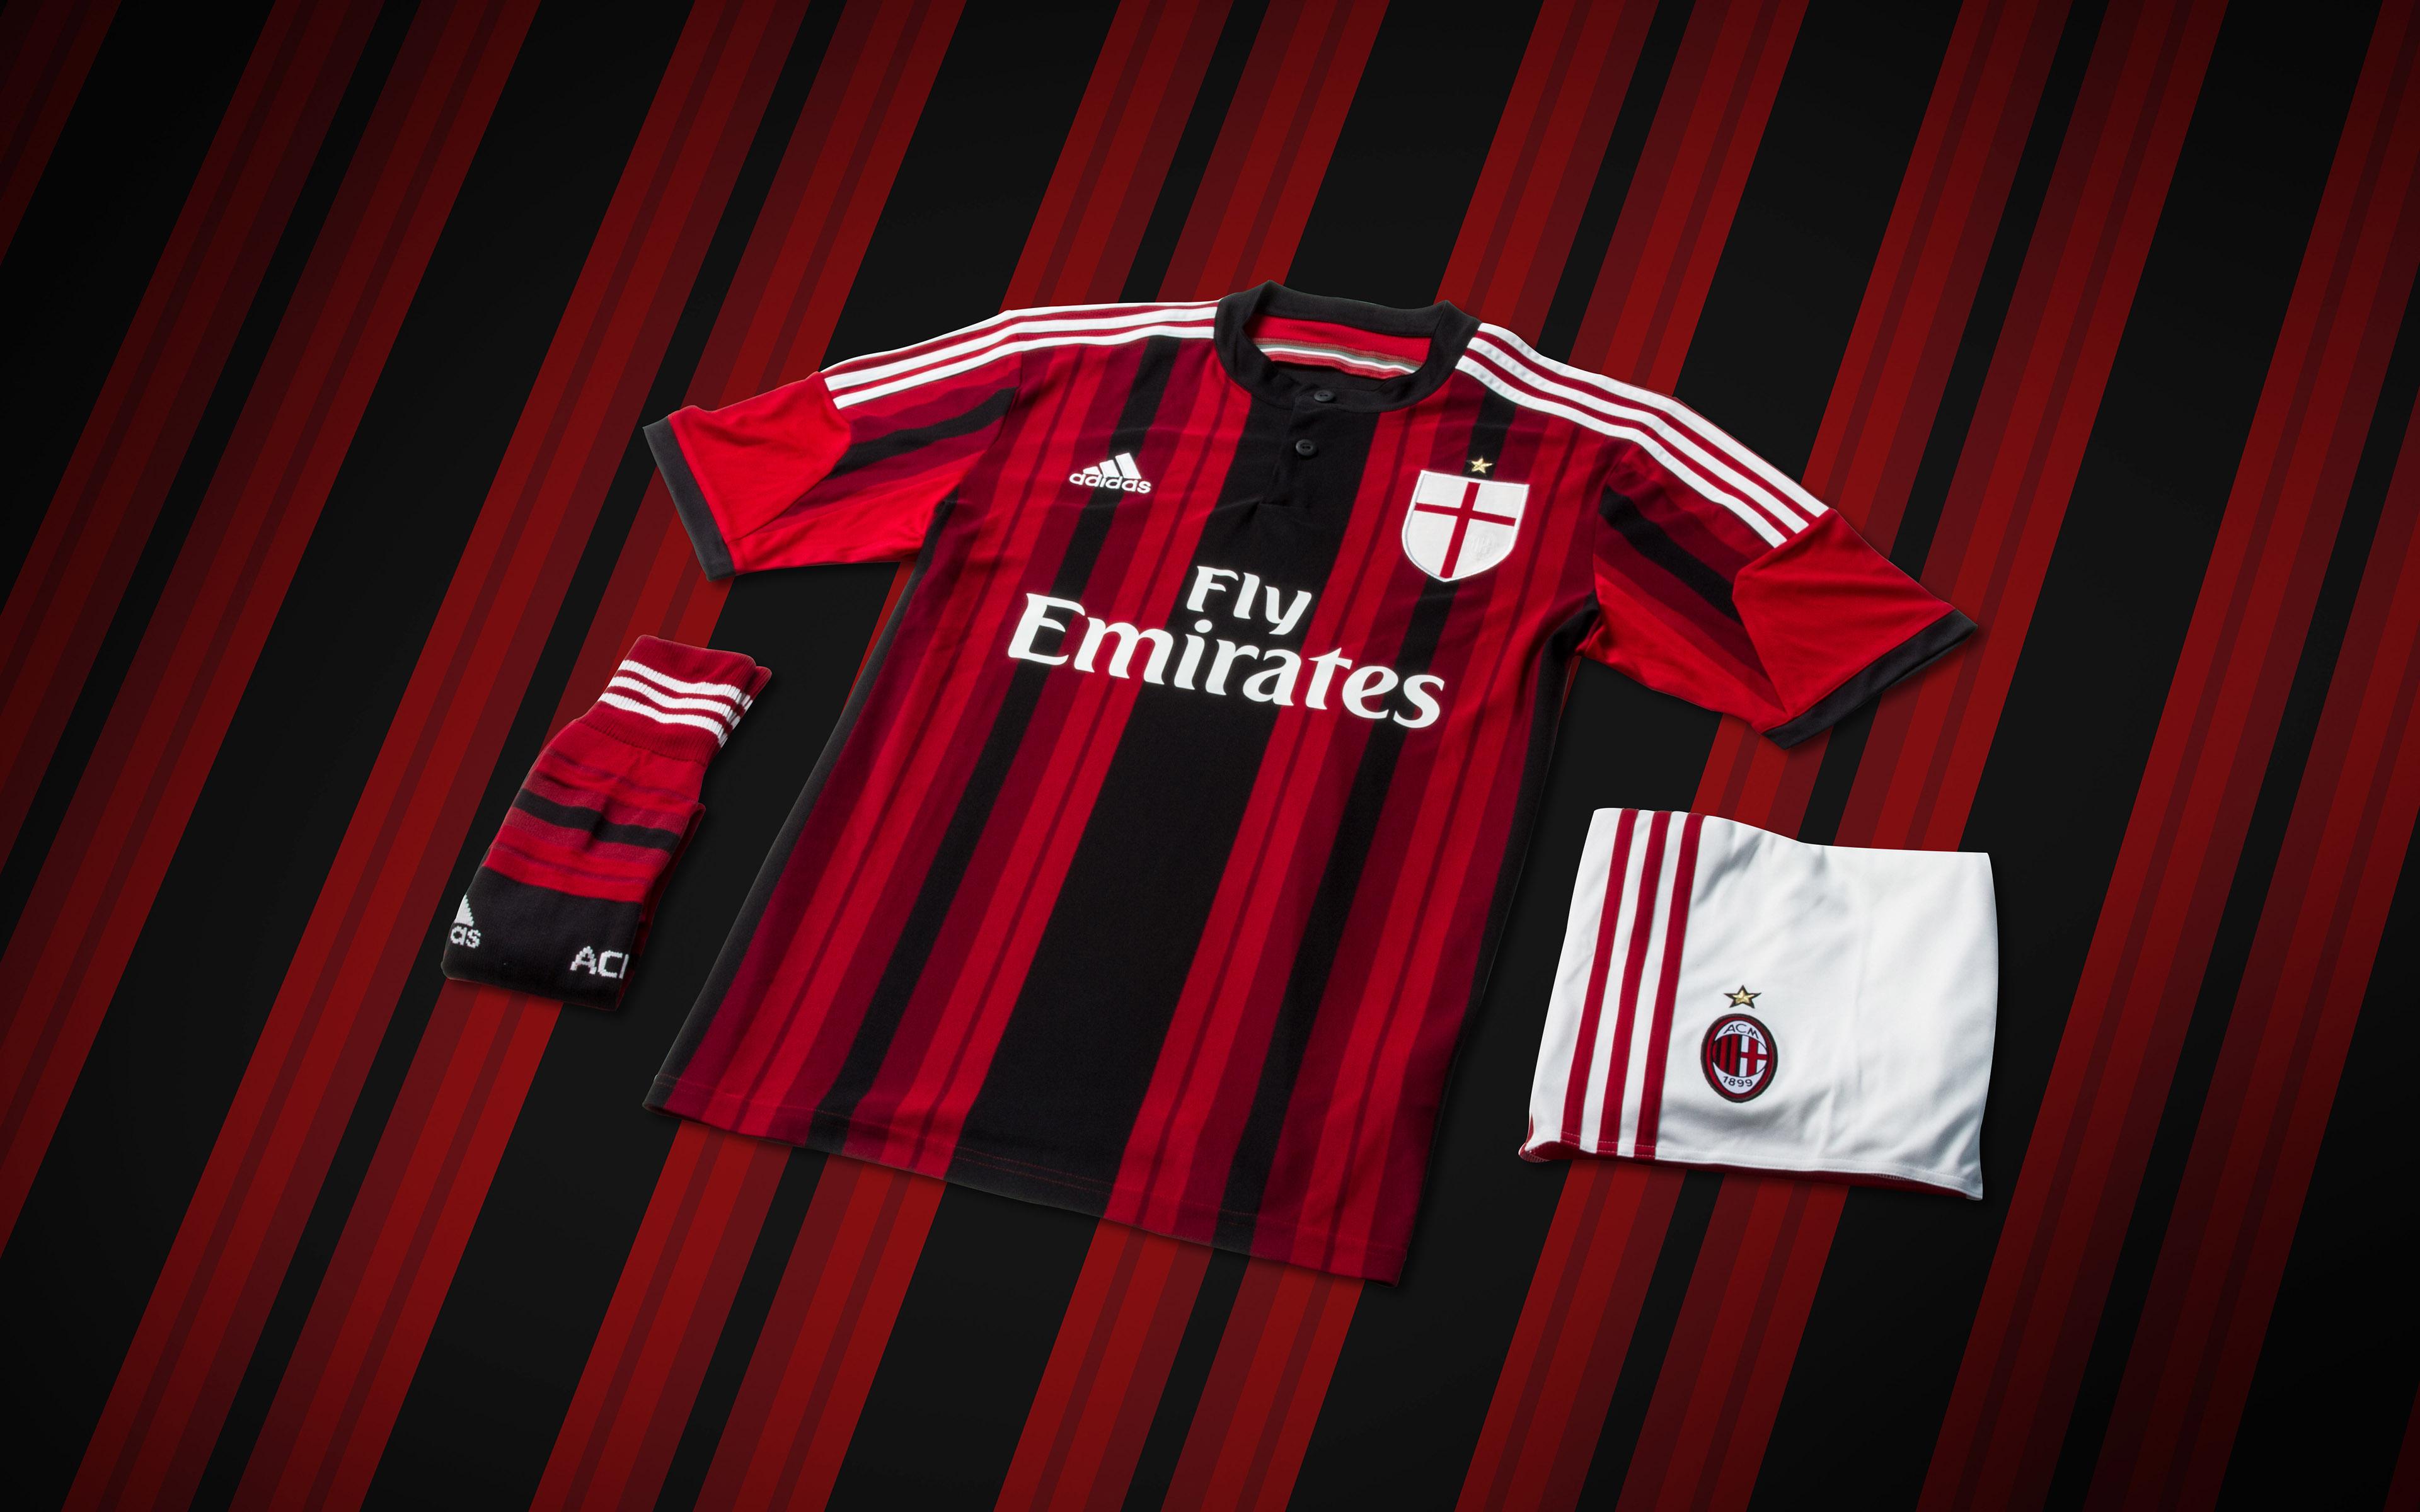 Messi Wallpaper 2014 3d Ac Milan Hd Wallpaper Pixelstalk Net